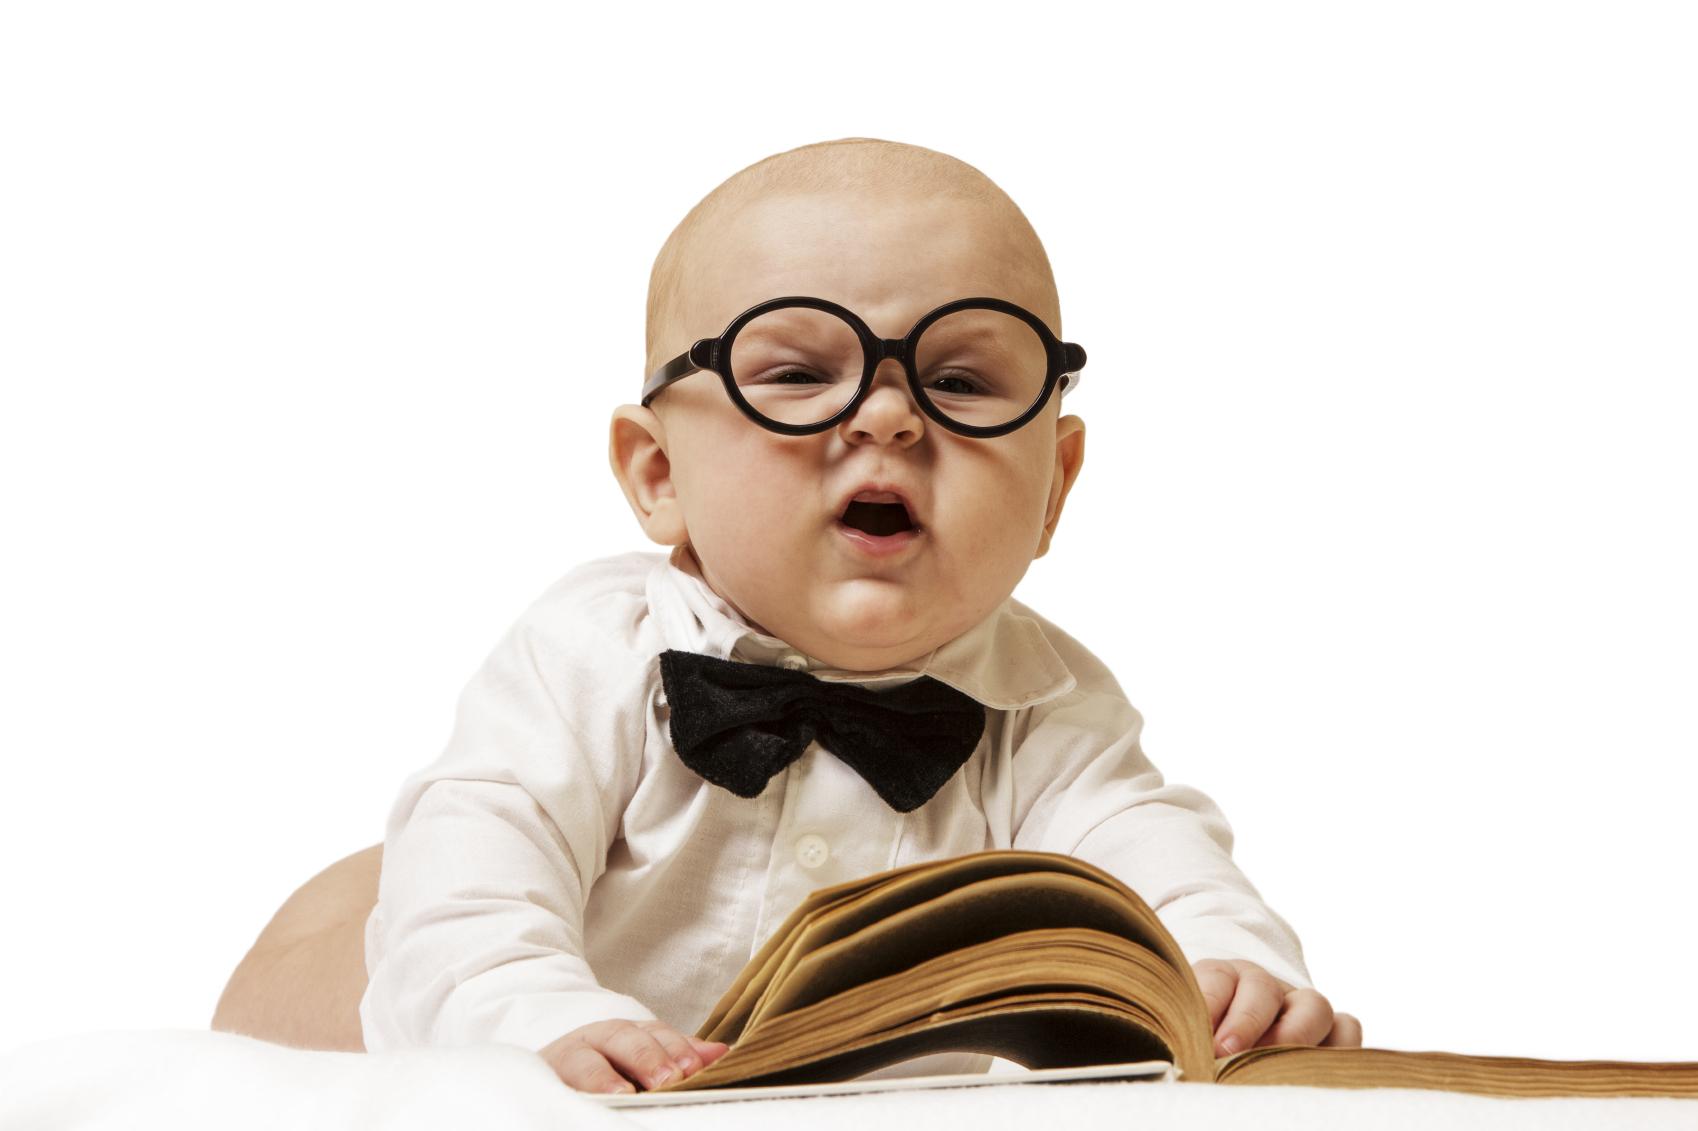 بالصور كيف اعرف ان الطفل ذكي 20160628 961